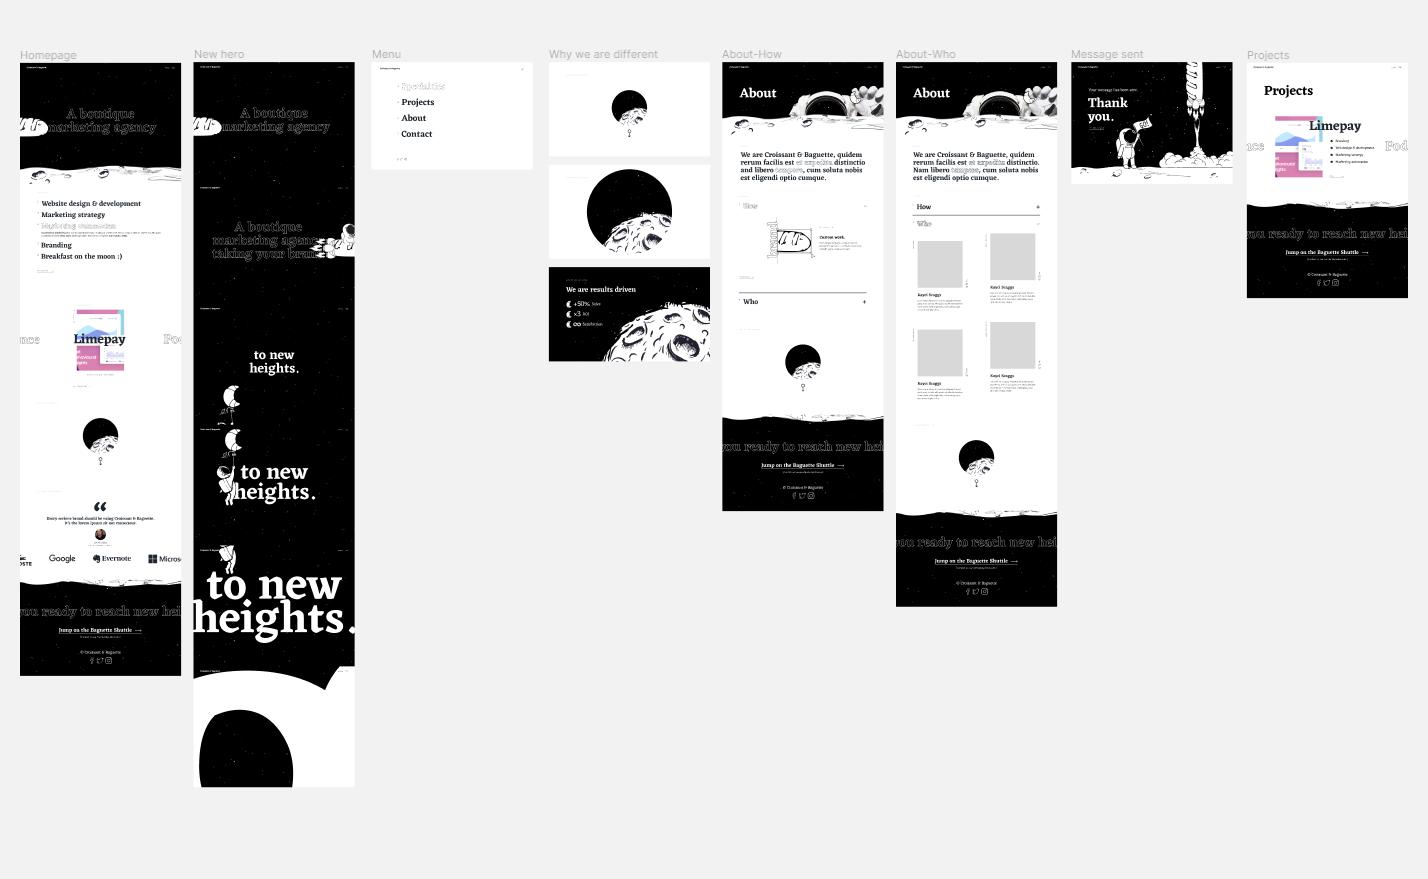 Funky, fun, creative, different, quirky - Boutique digital marketing agency seeking UNIQUE website design